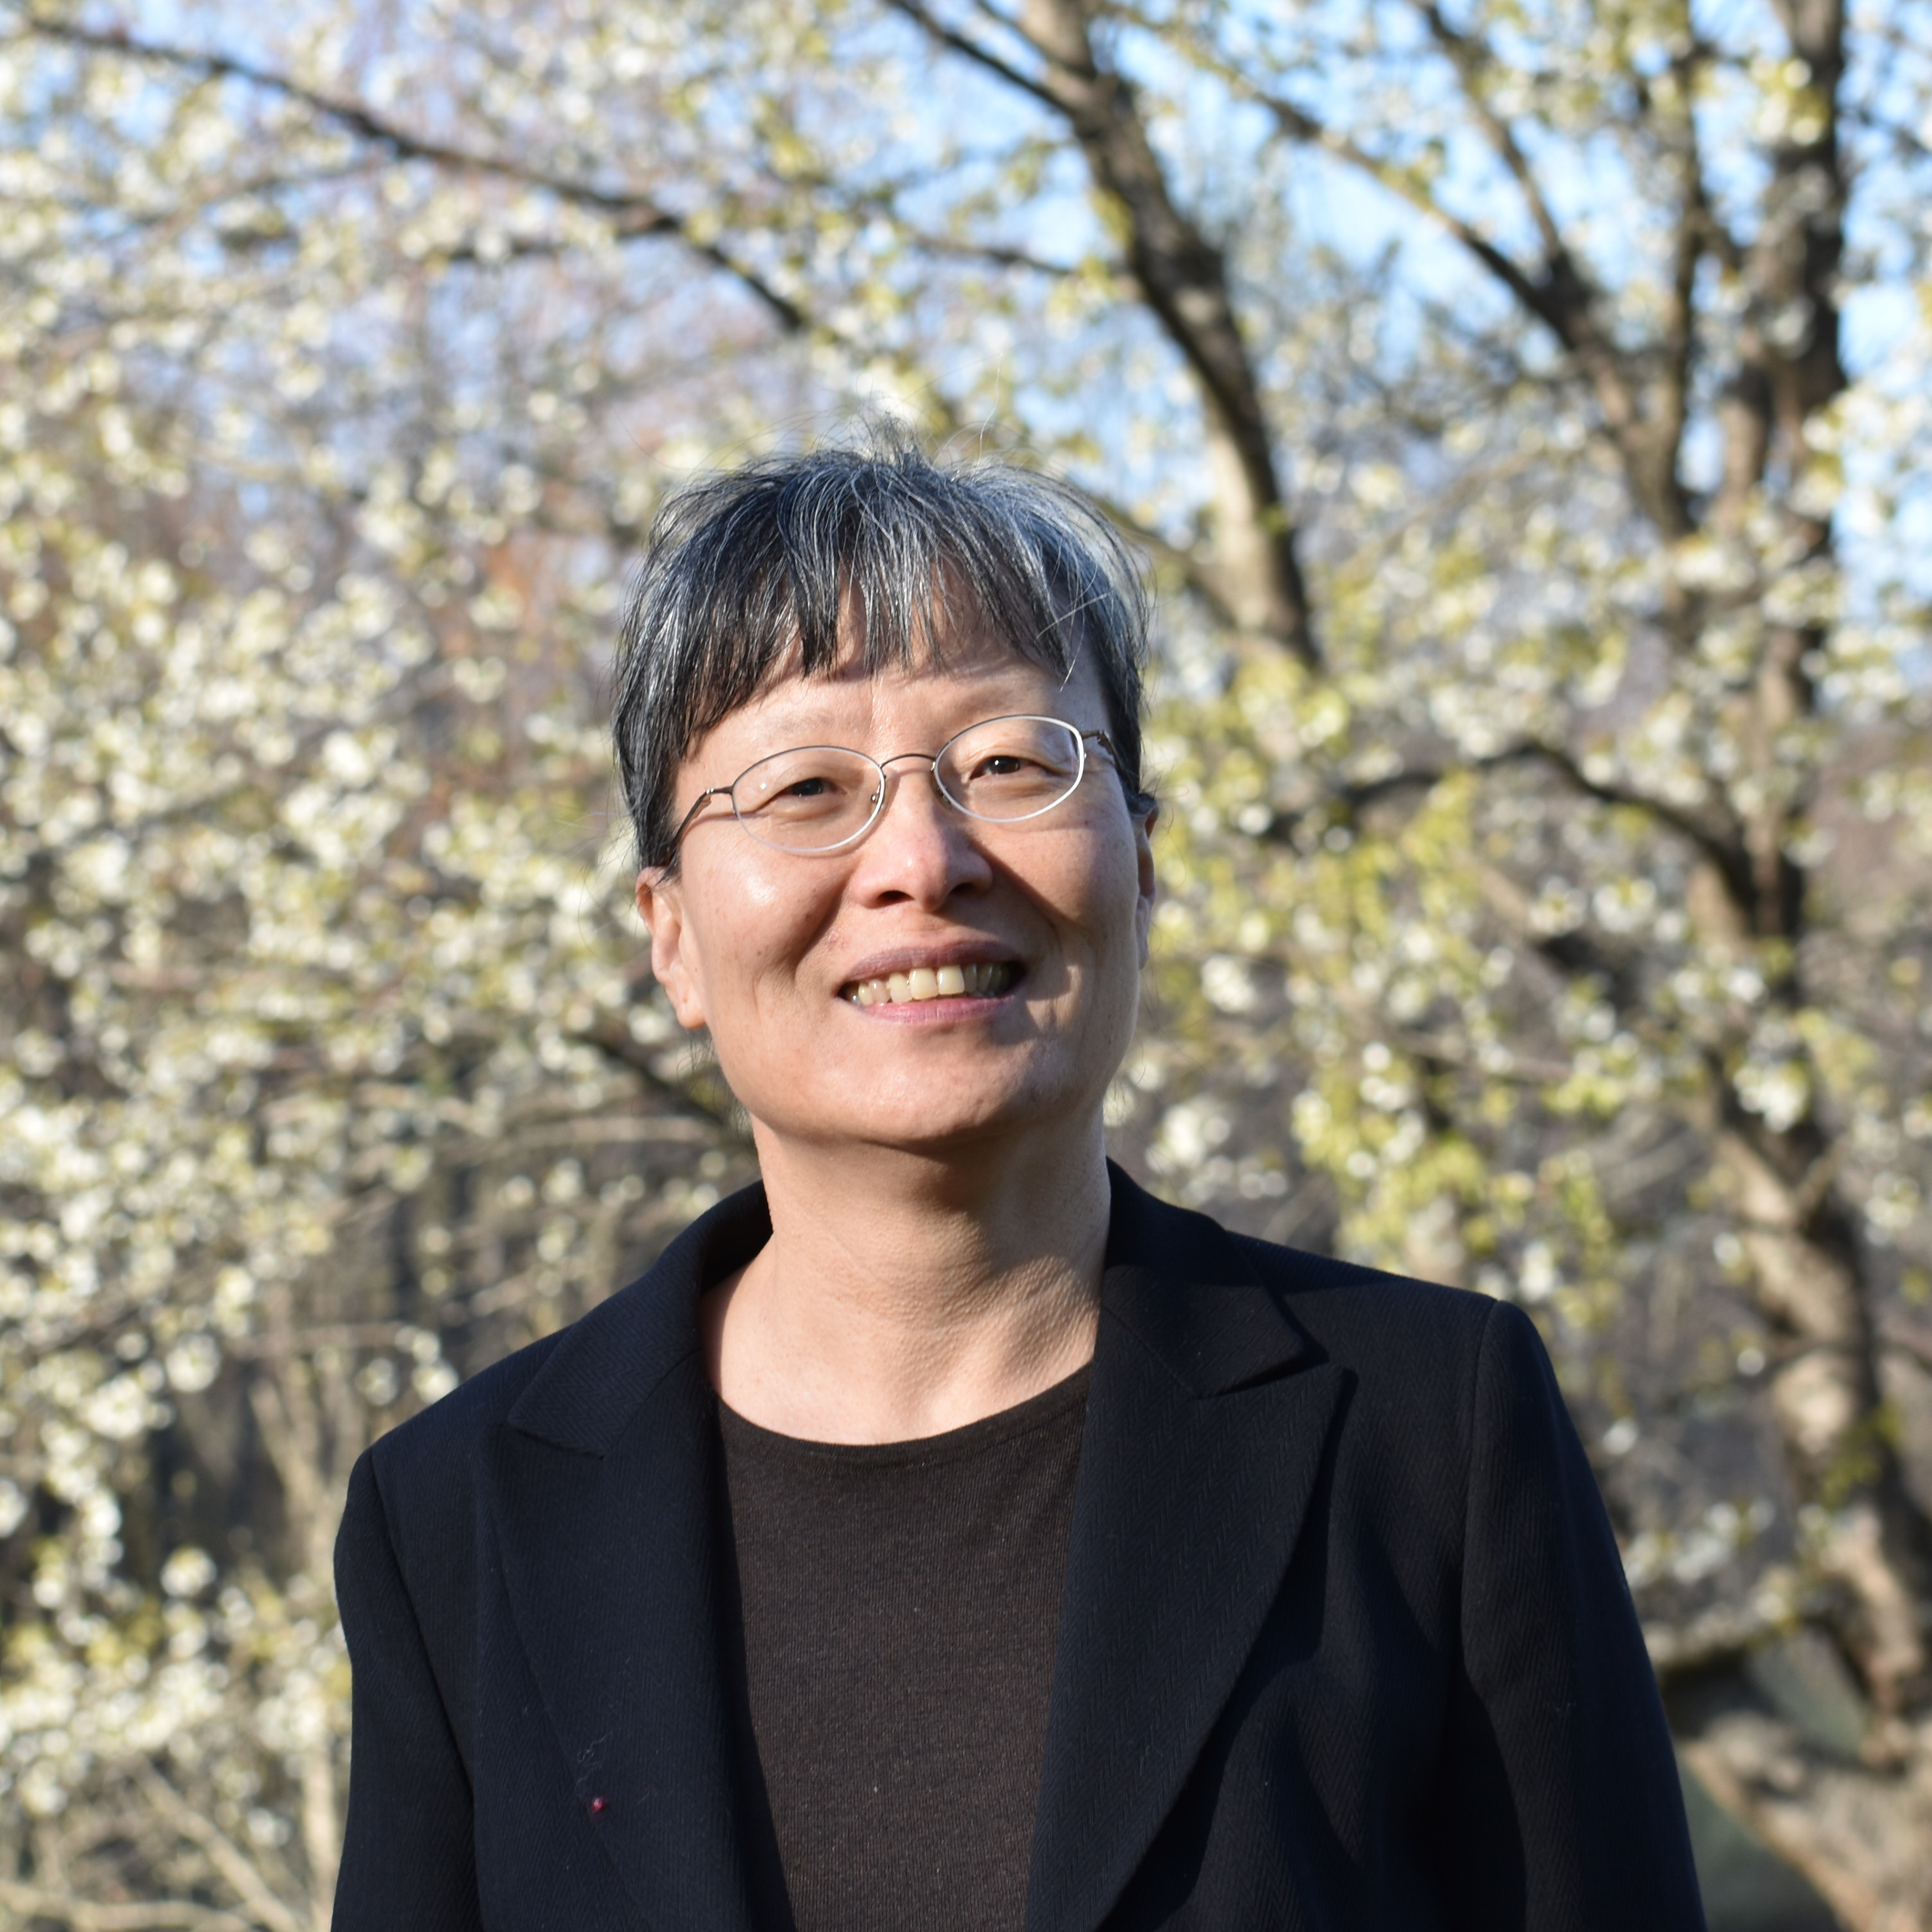 Portrait of Lixin Gao